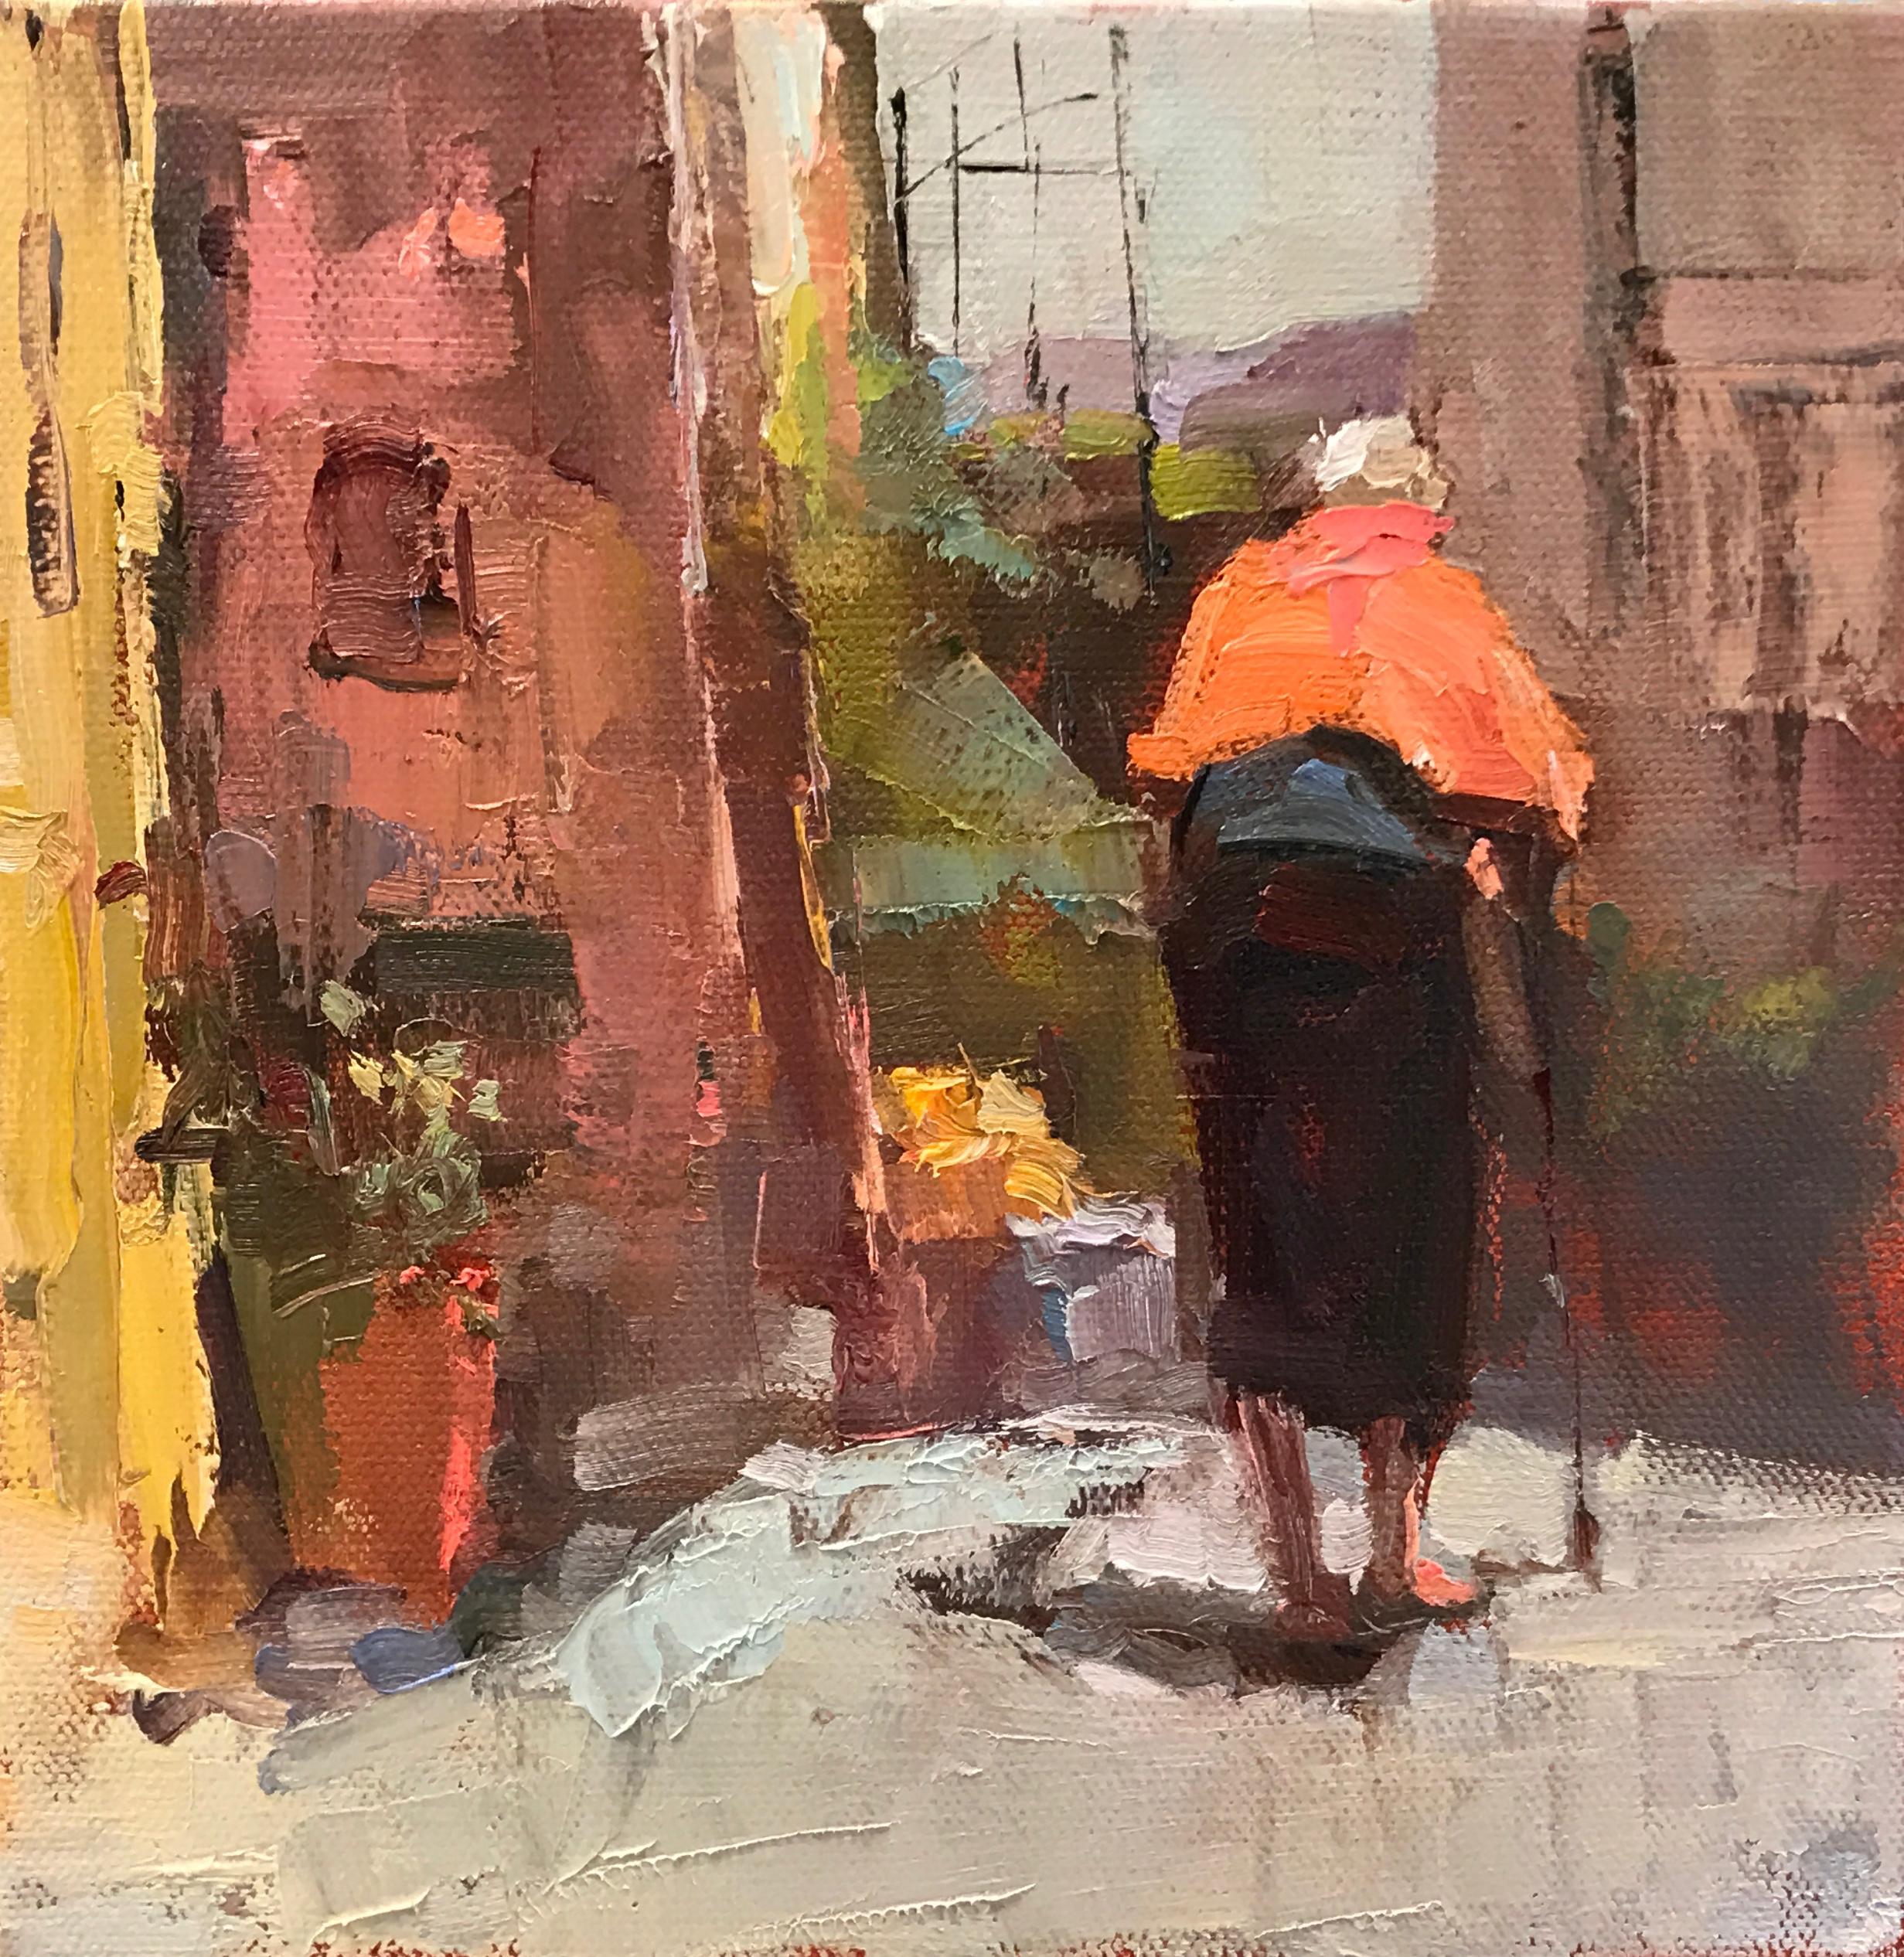 Italian Grandmother 8 x 8 oil on canvas